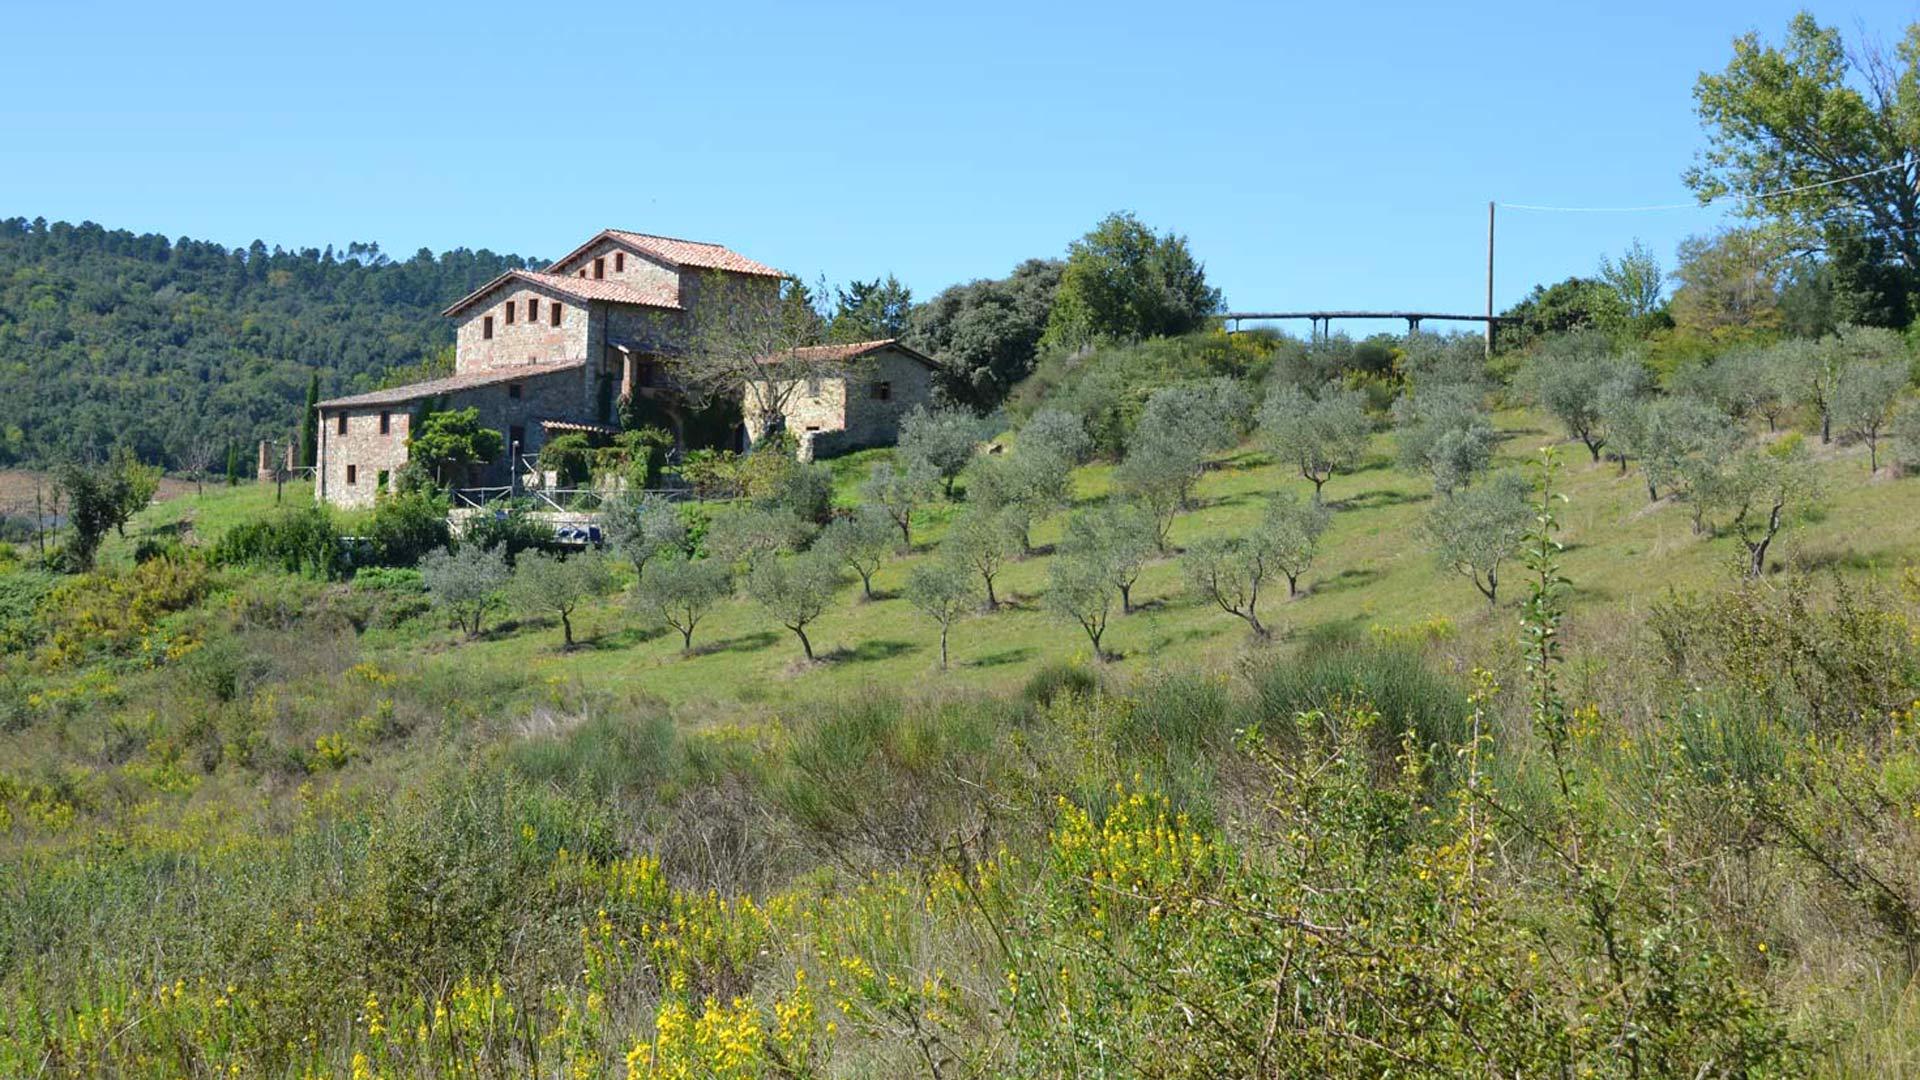 Palazzetto Farm House